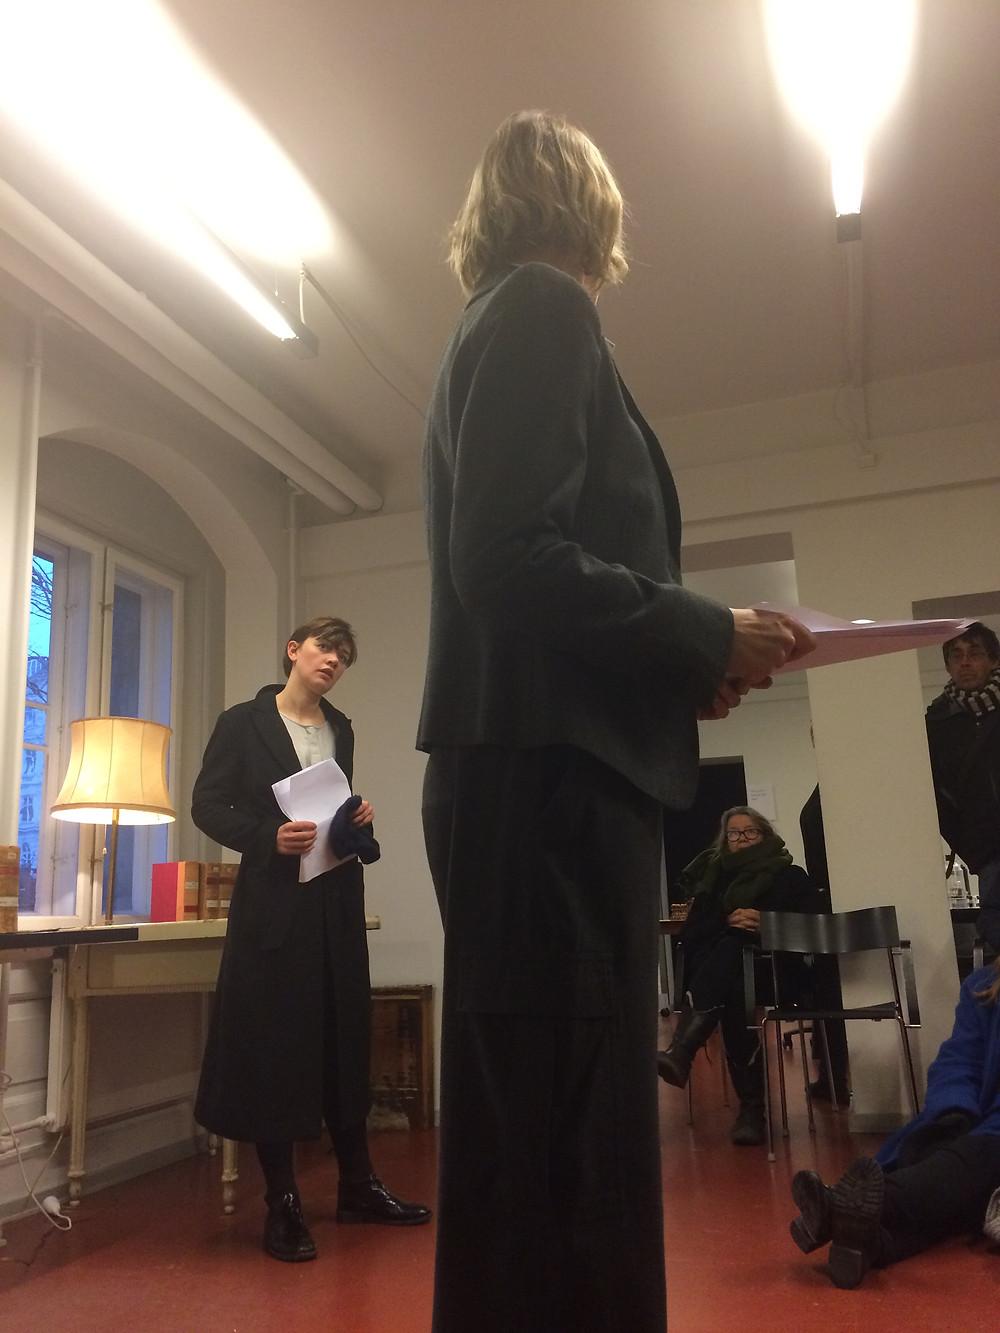 Drama Queens Inge Lehmann